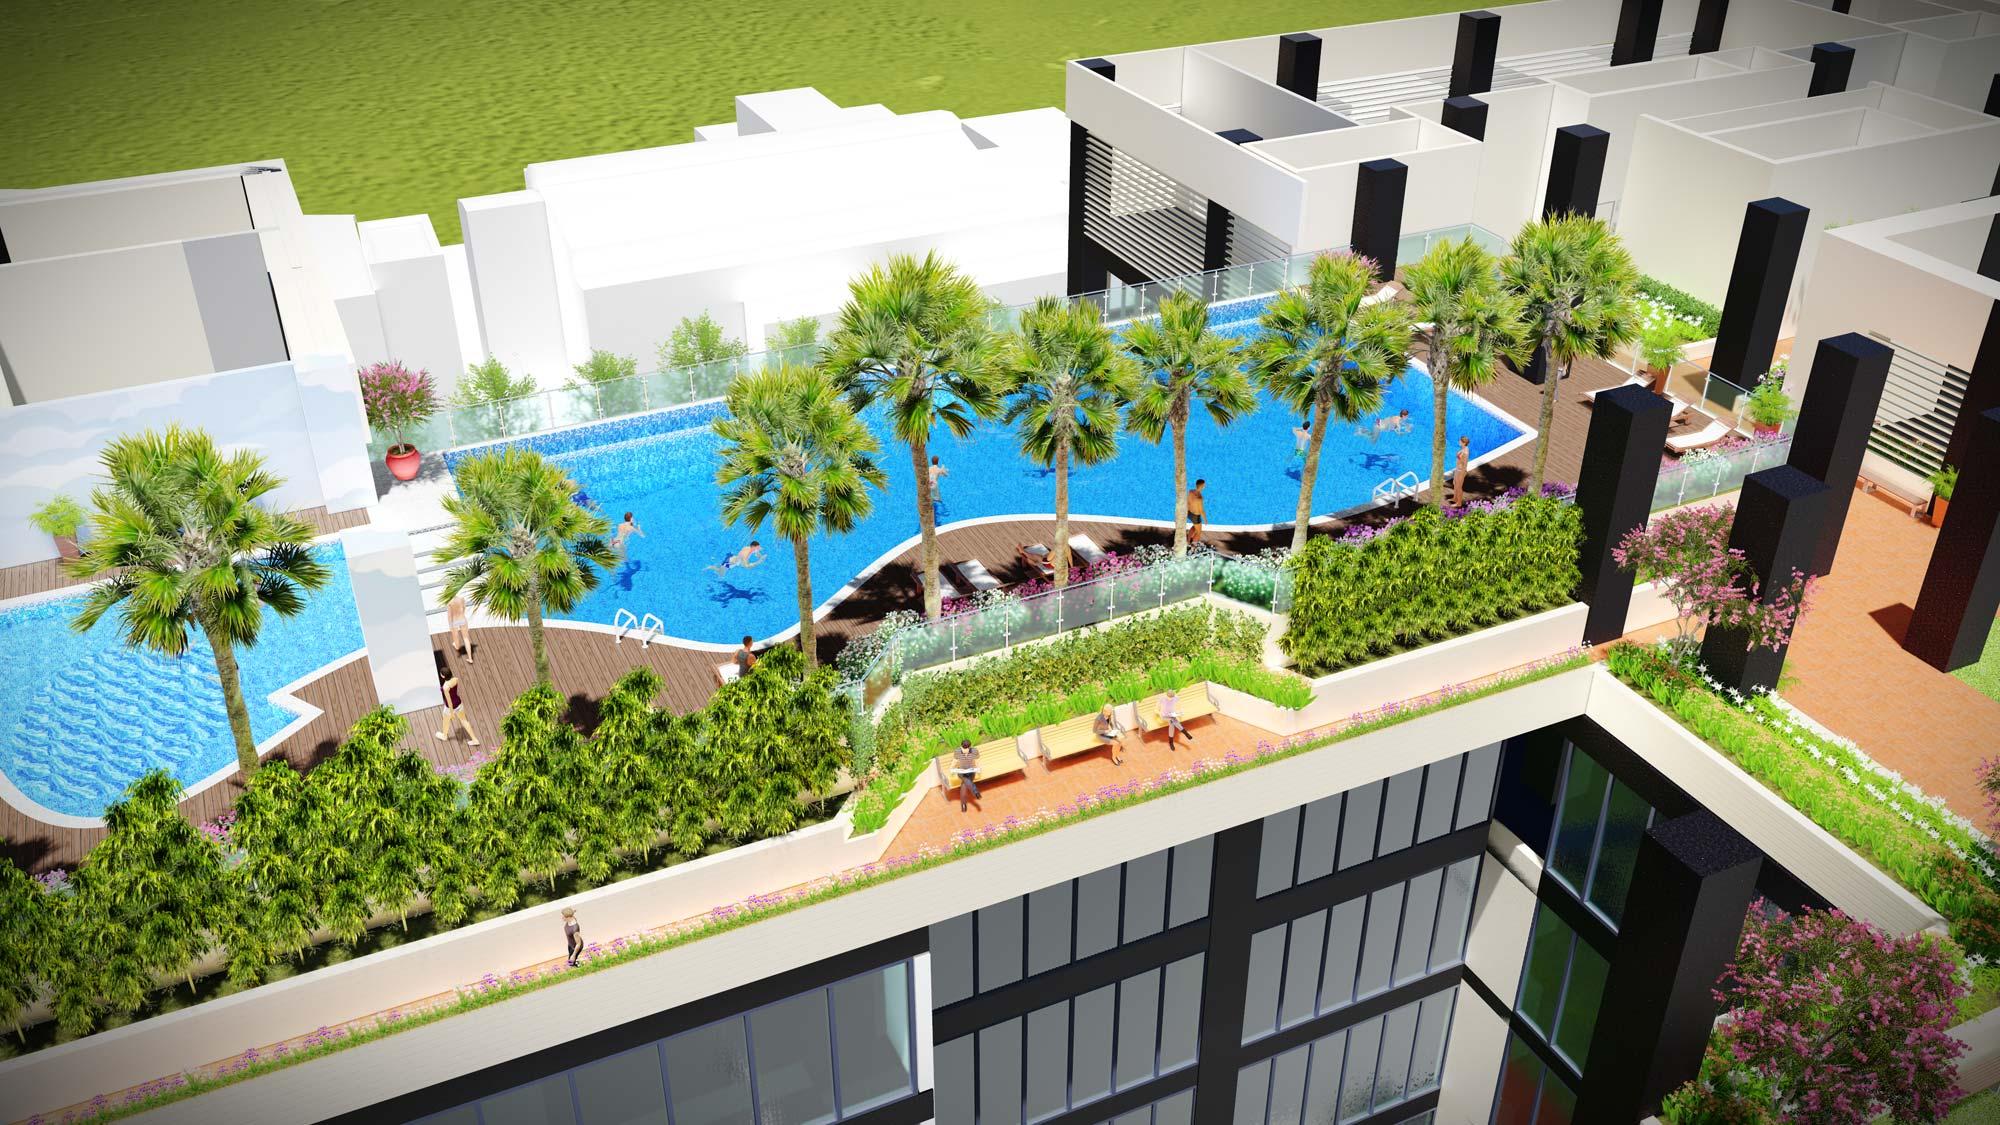 Ede Landscape thiết kế cảnh quan Mandarin Garden 2 6